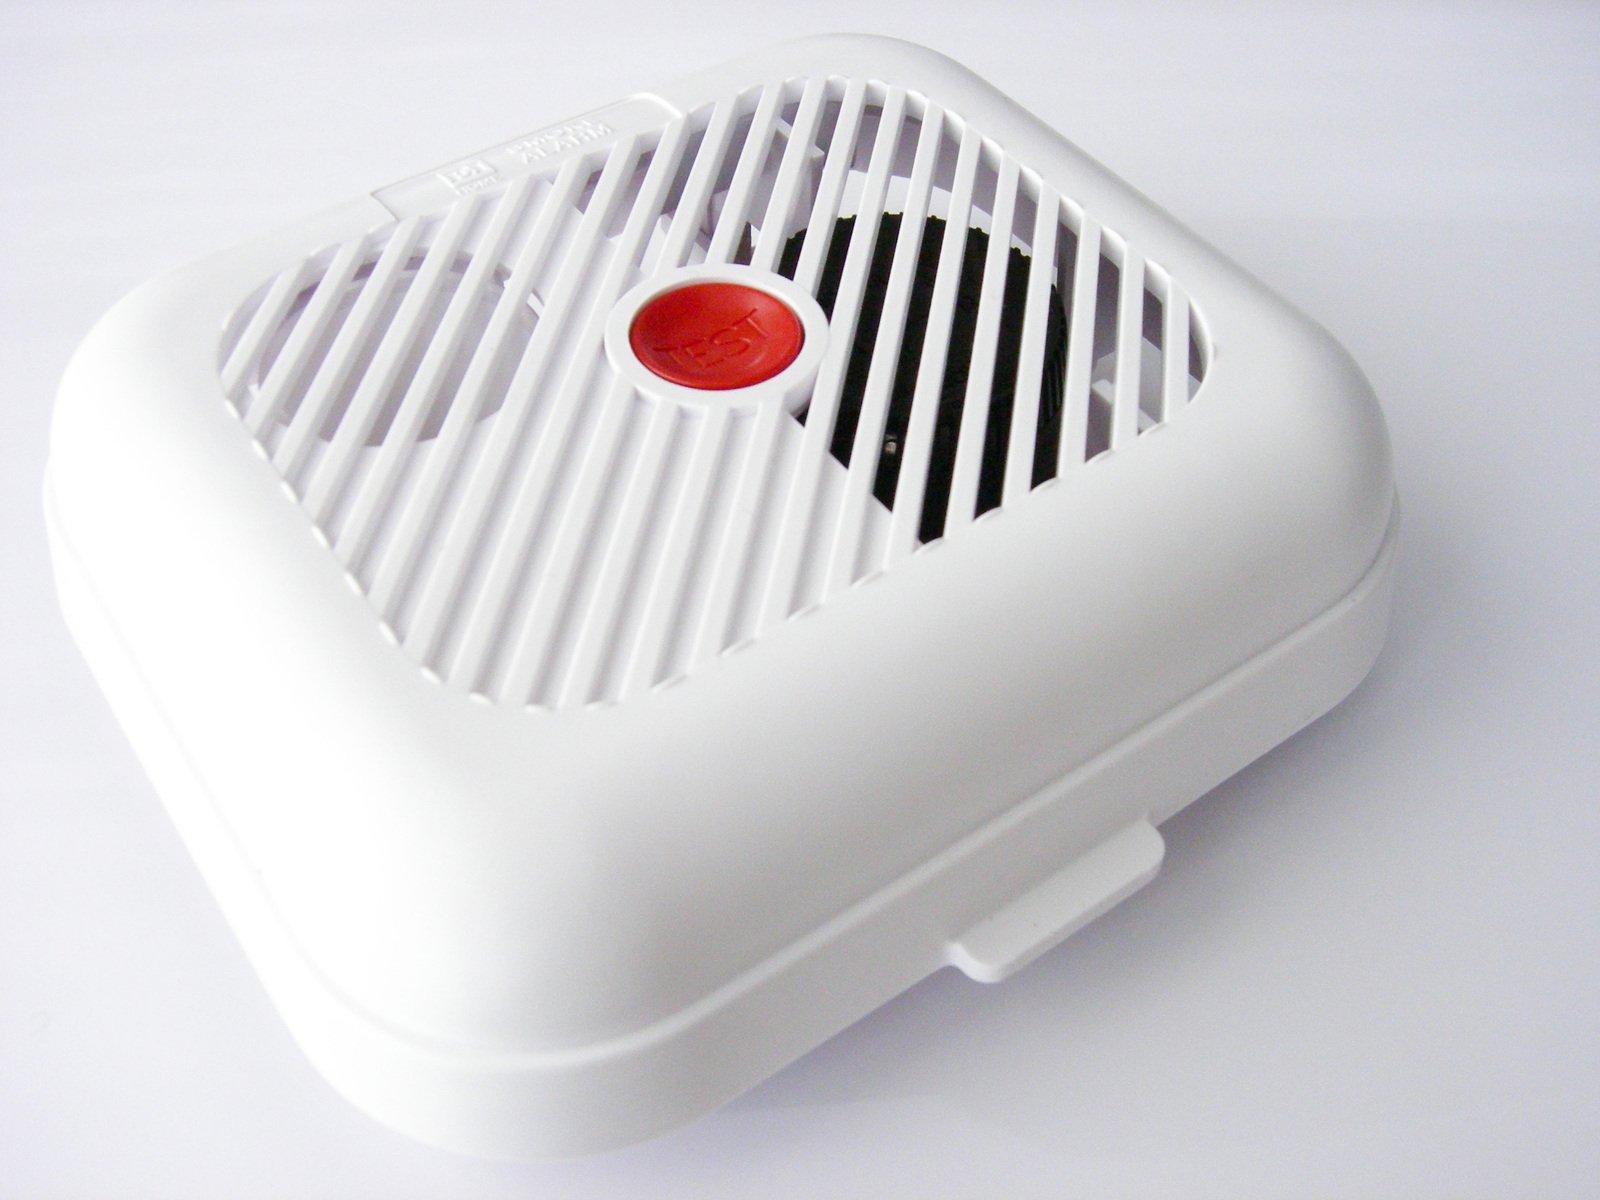 Change Smoke Alarm Batteries When Clocks Go Back